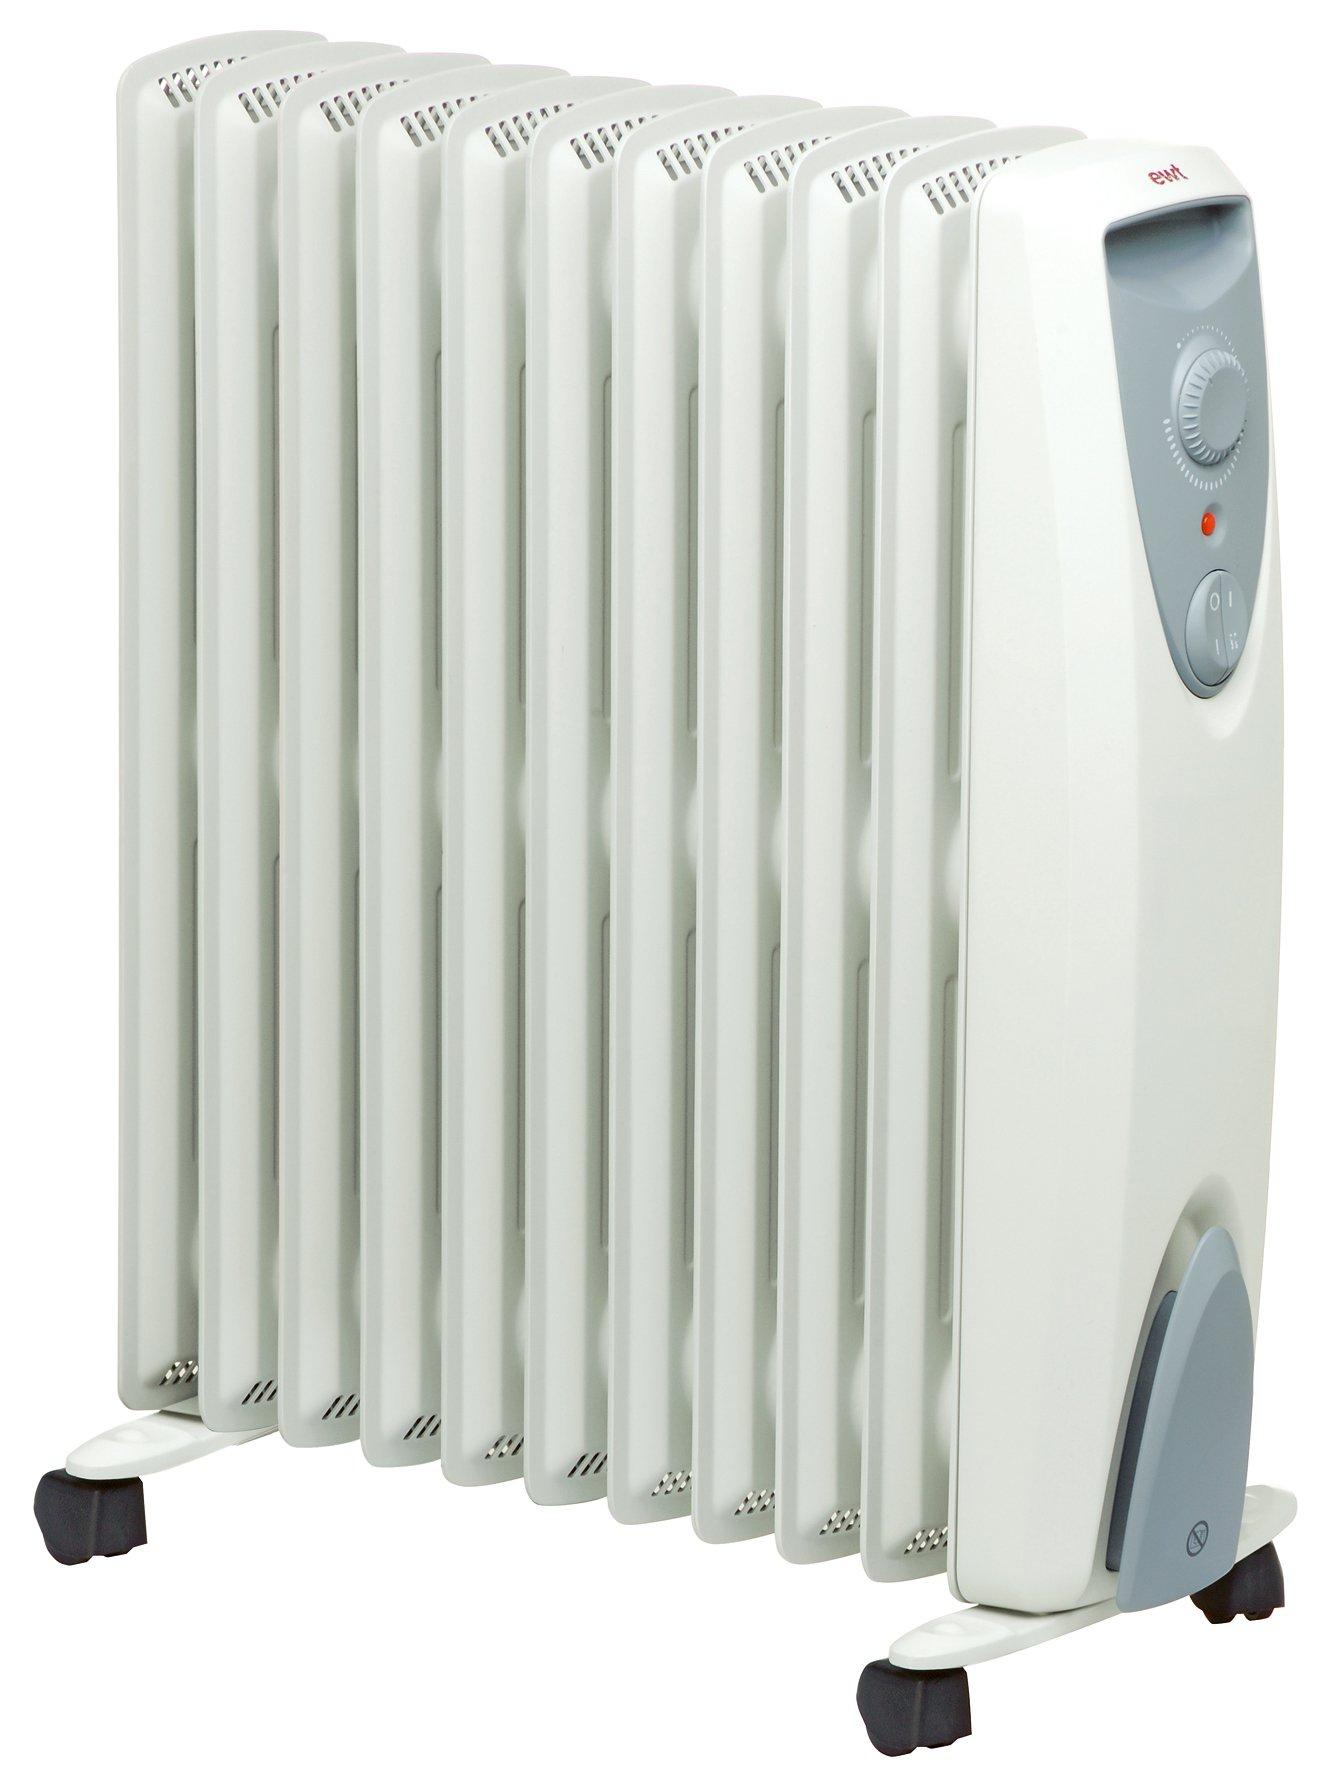 EWT 12111500 NOC eco 25 TLS - Radiador sin aceite product image